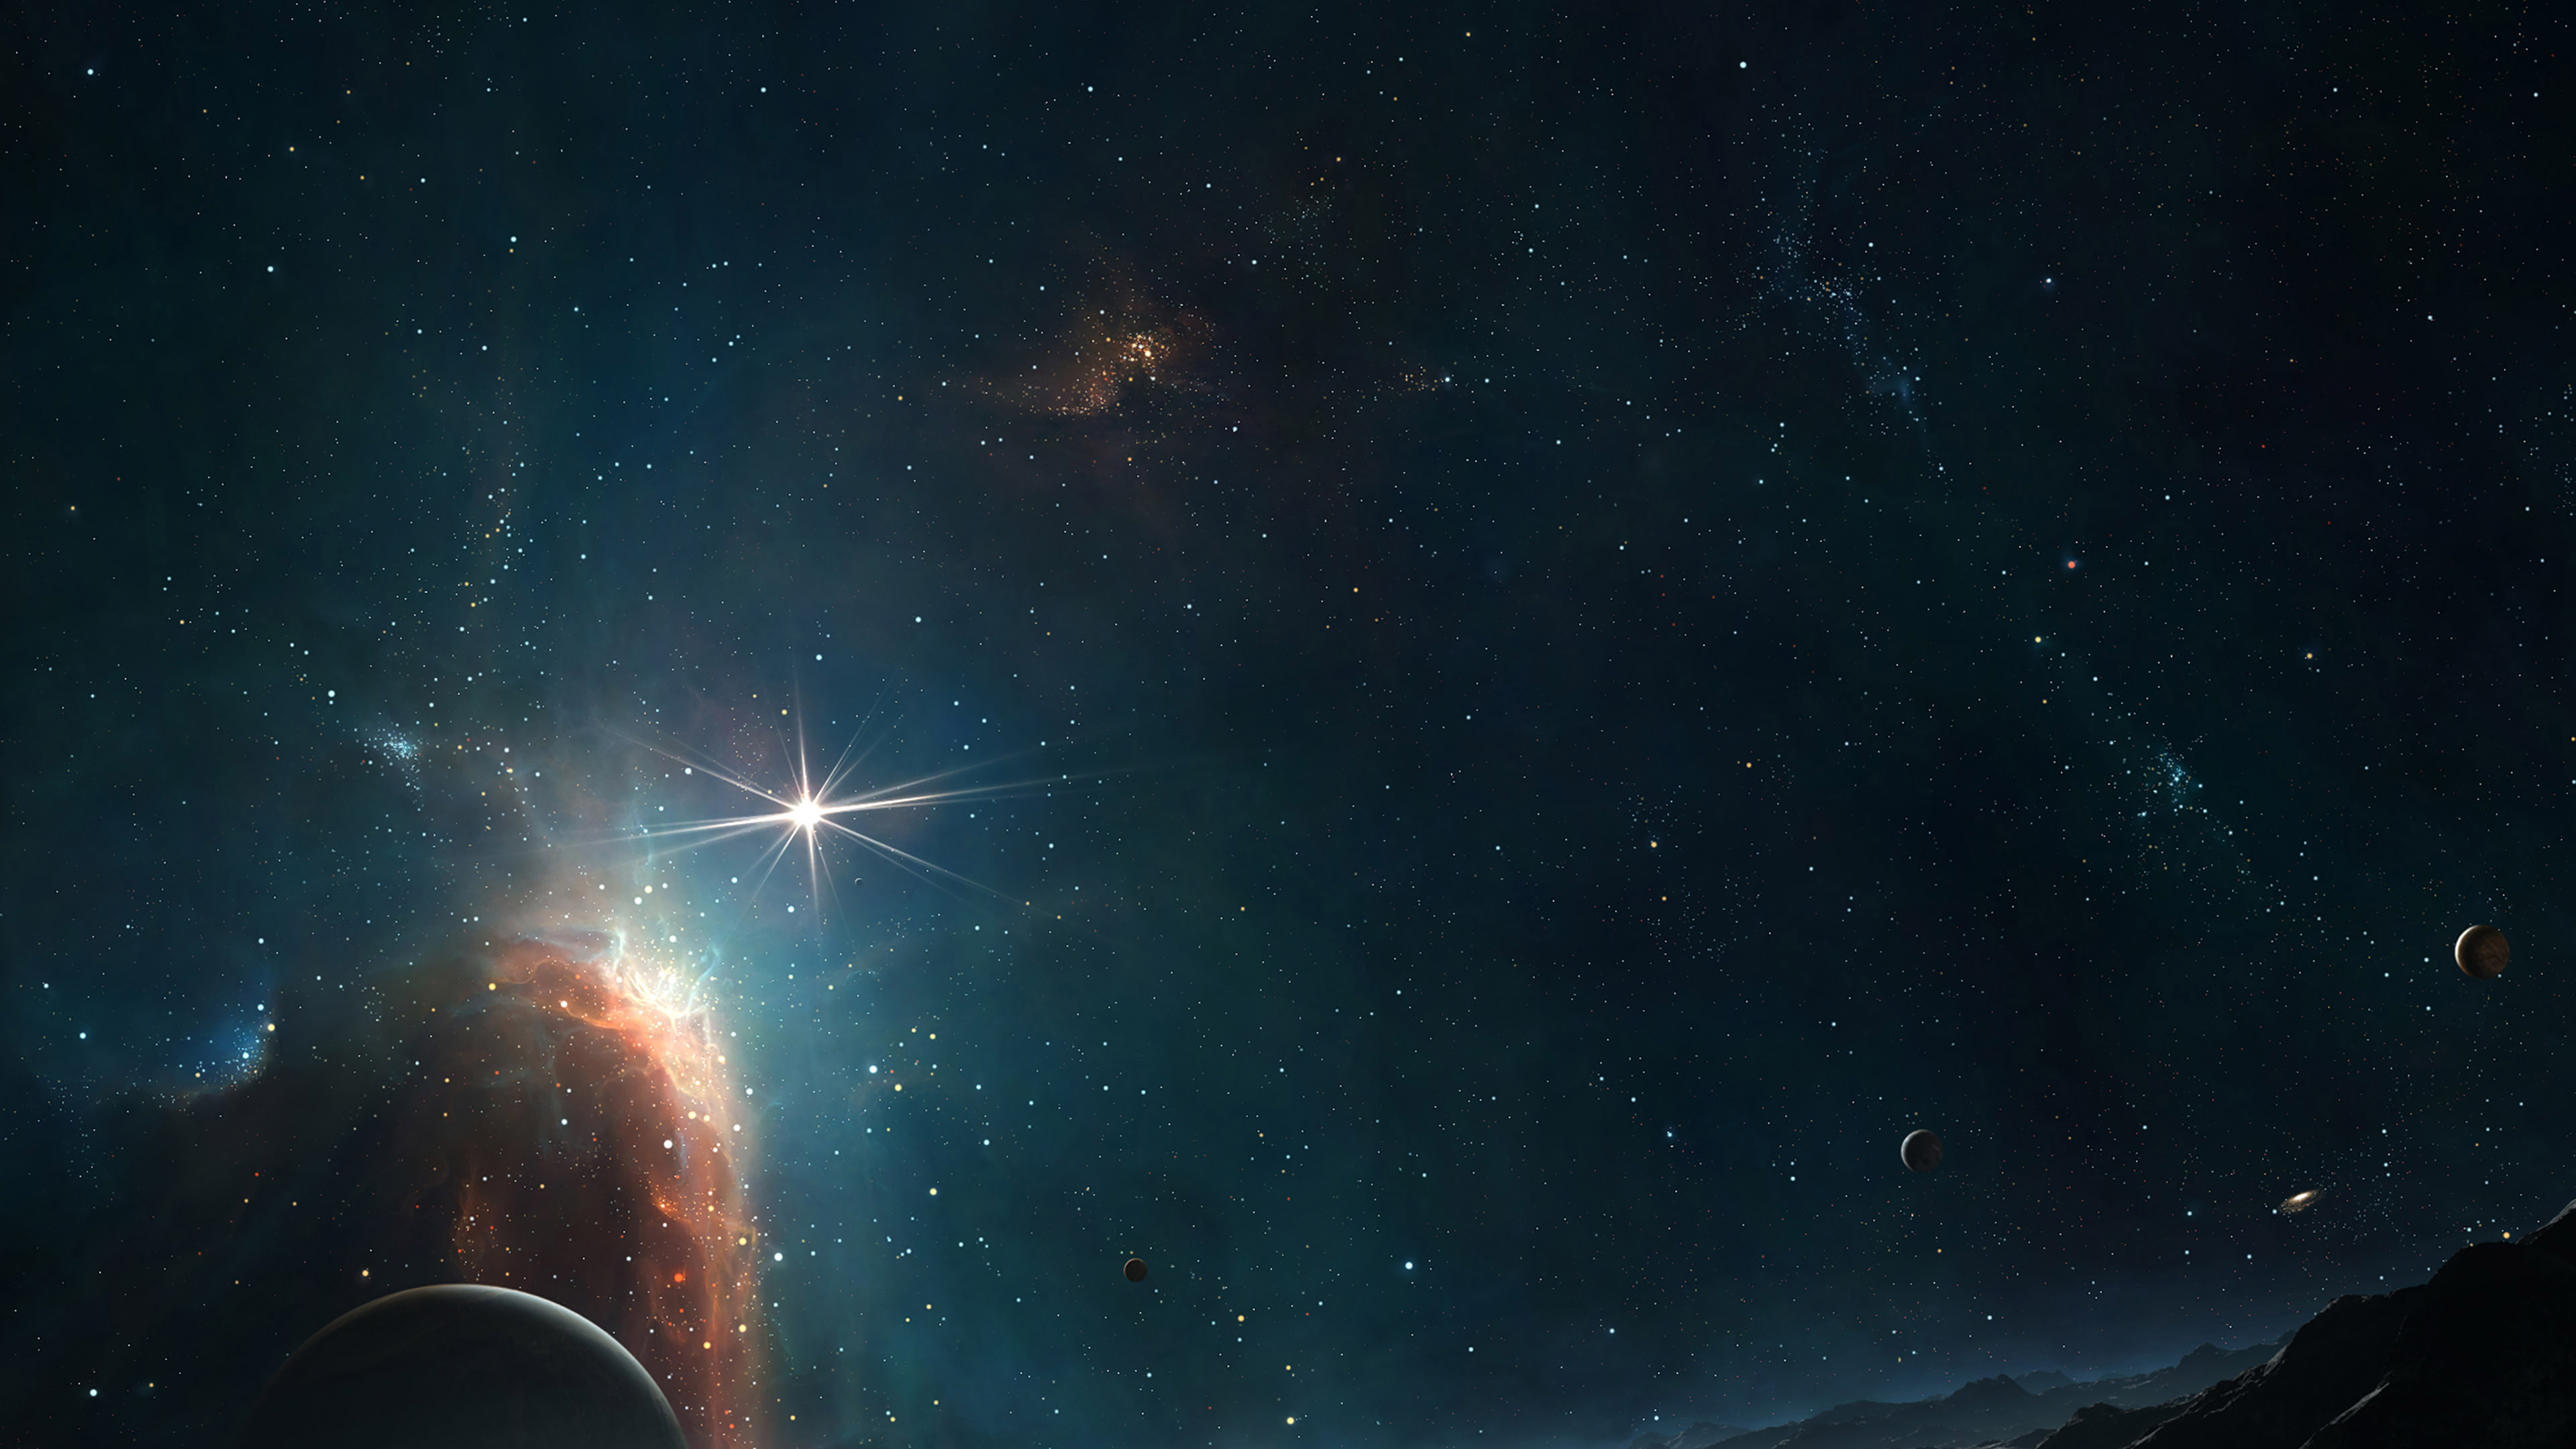 Ml31-dark-space-sky-planet-nature-art